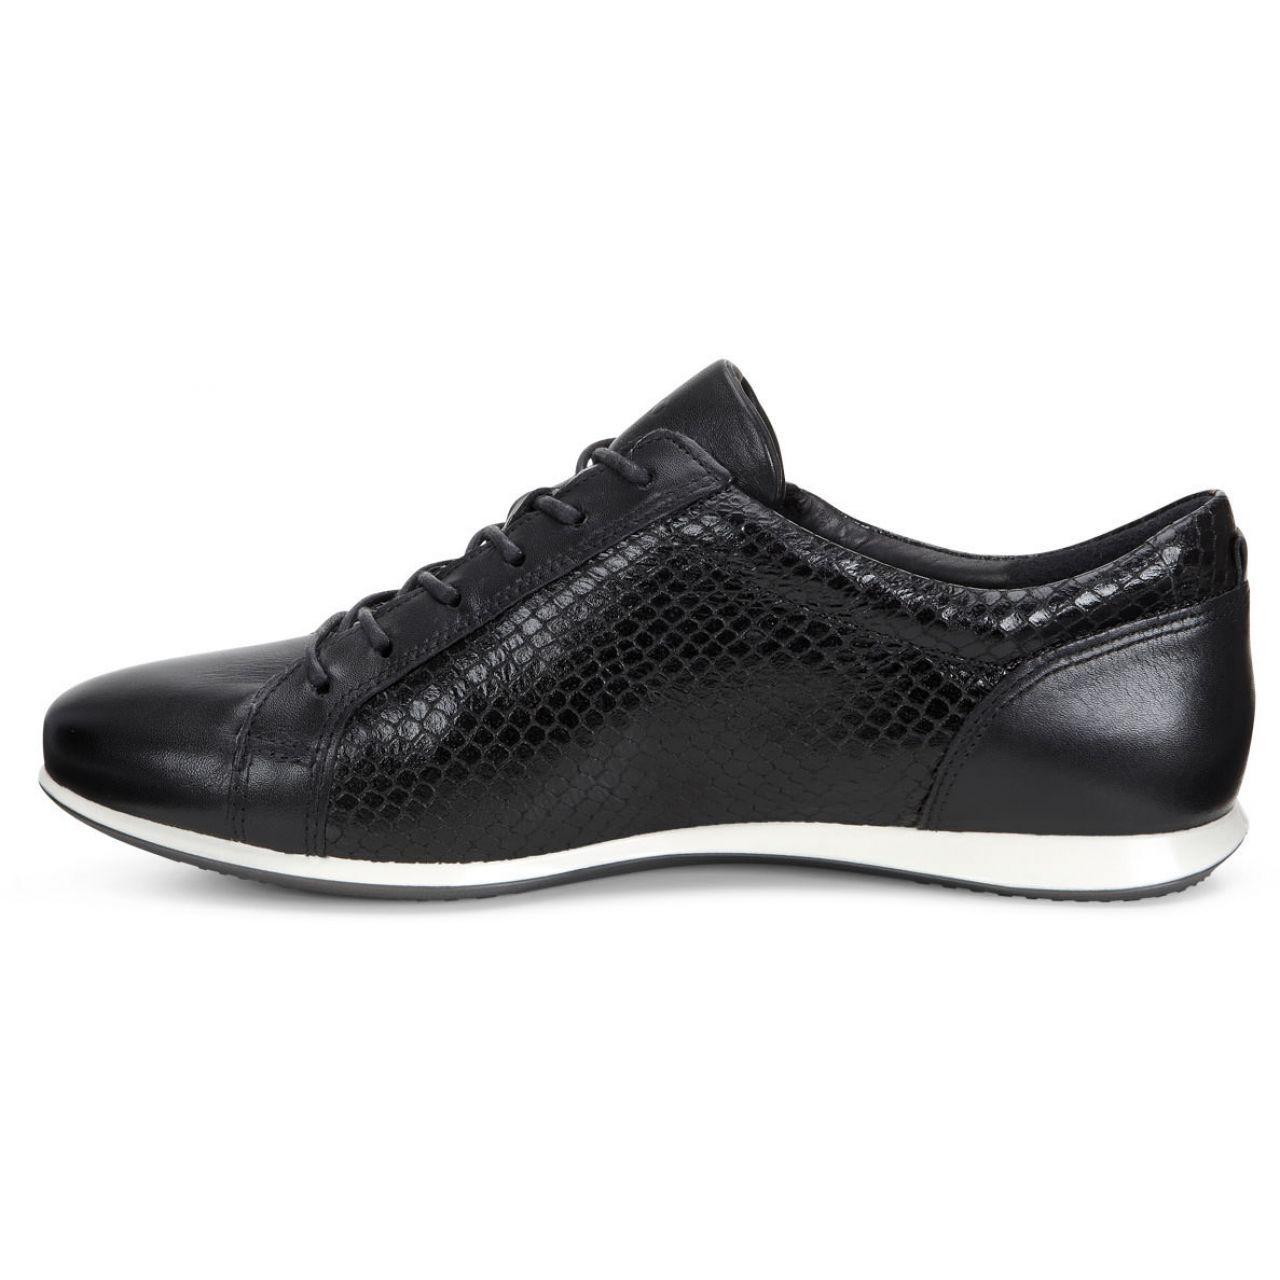 Women's Shoes ECCO Touch Sneaker BlackBlack,ecco winter